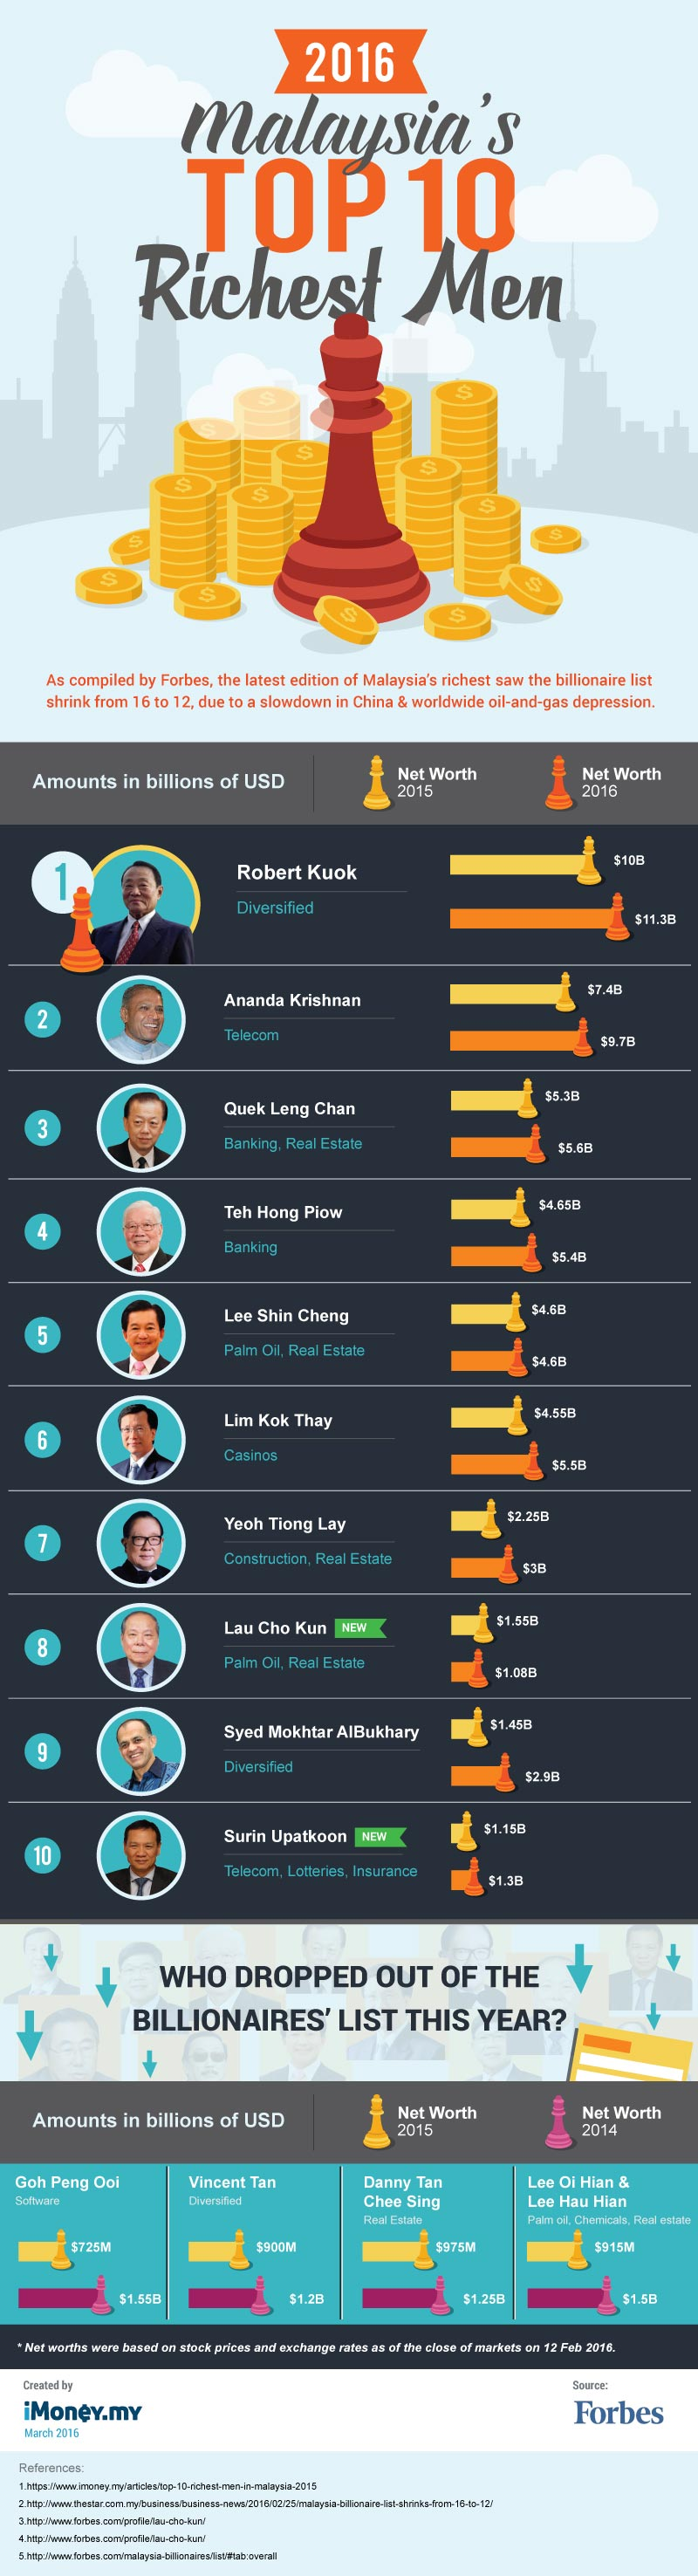 Malaysia S Top 10 Richest Men 2016 Imoney